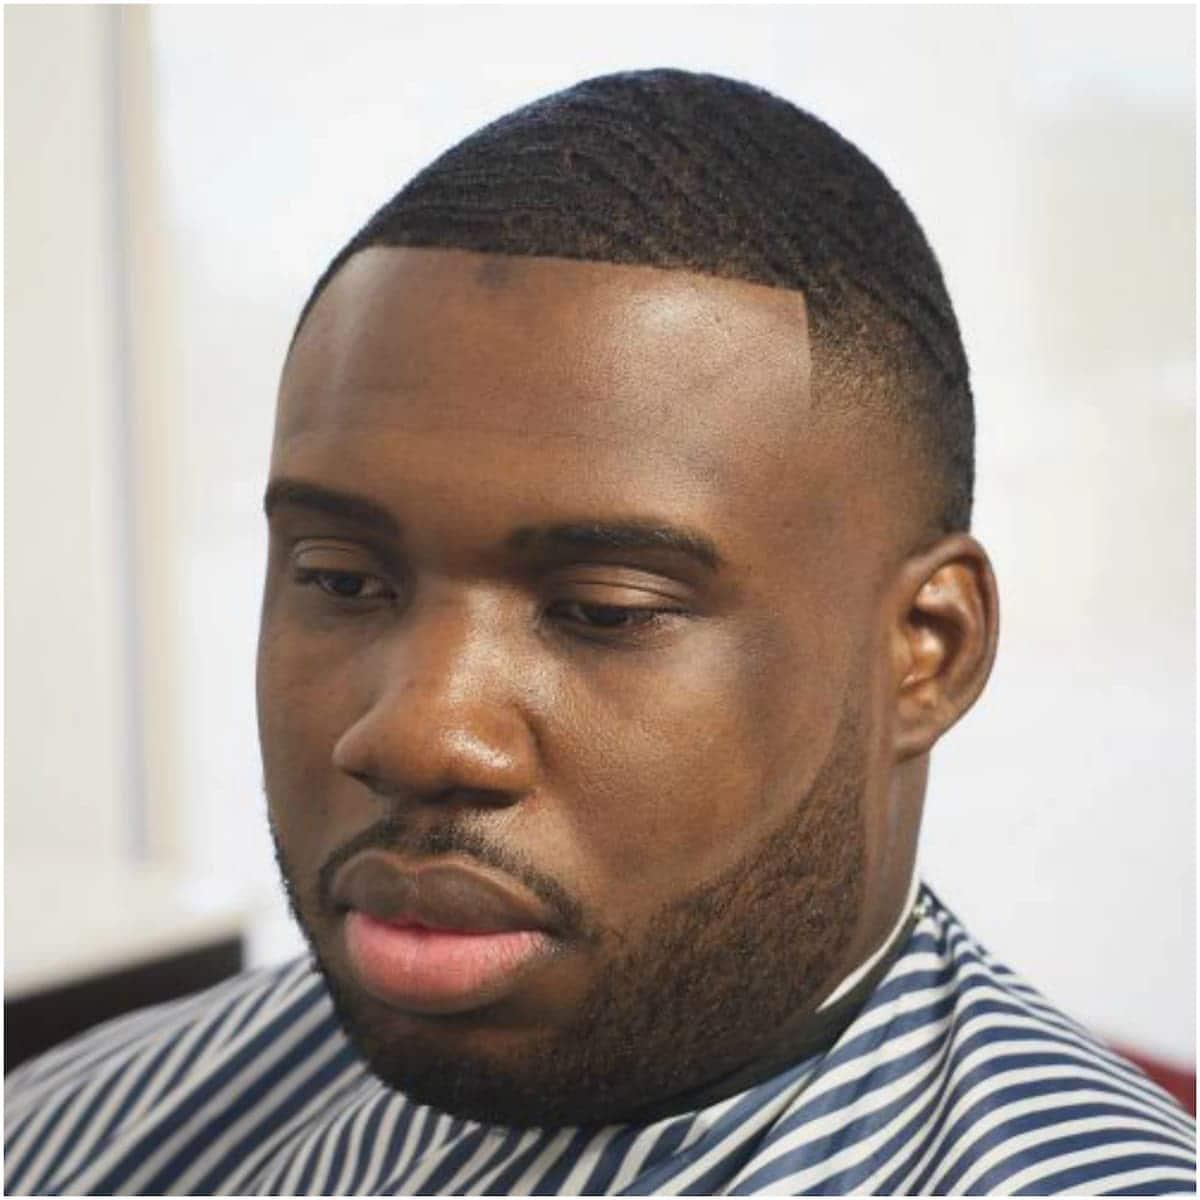 Buzz cut casual black men hairstyle